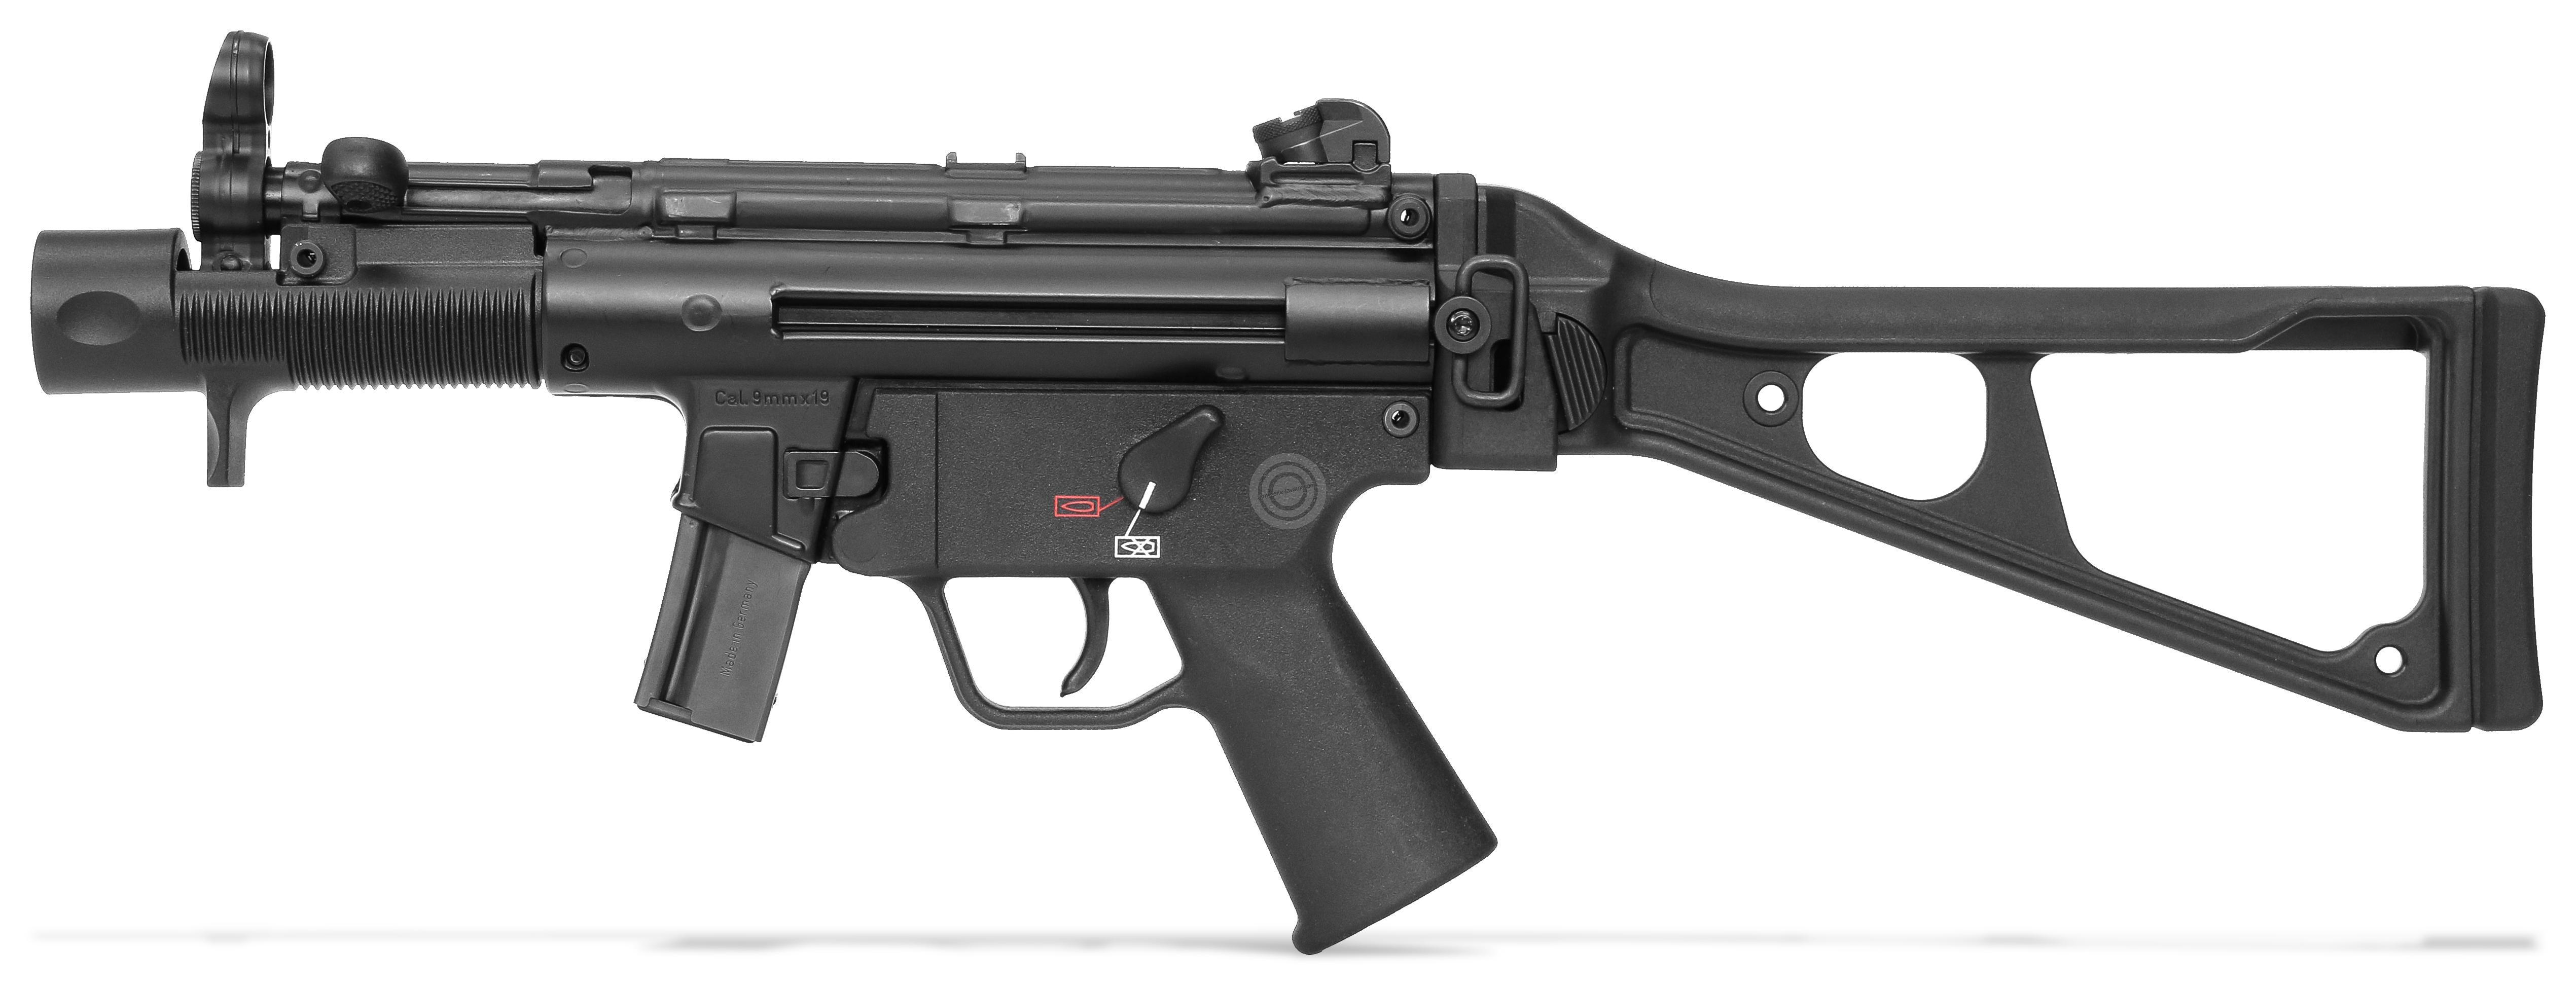 HK SP5K cal.9x19